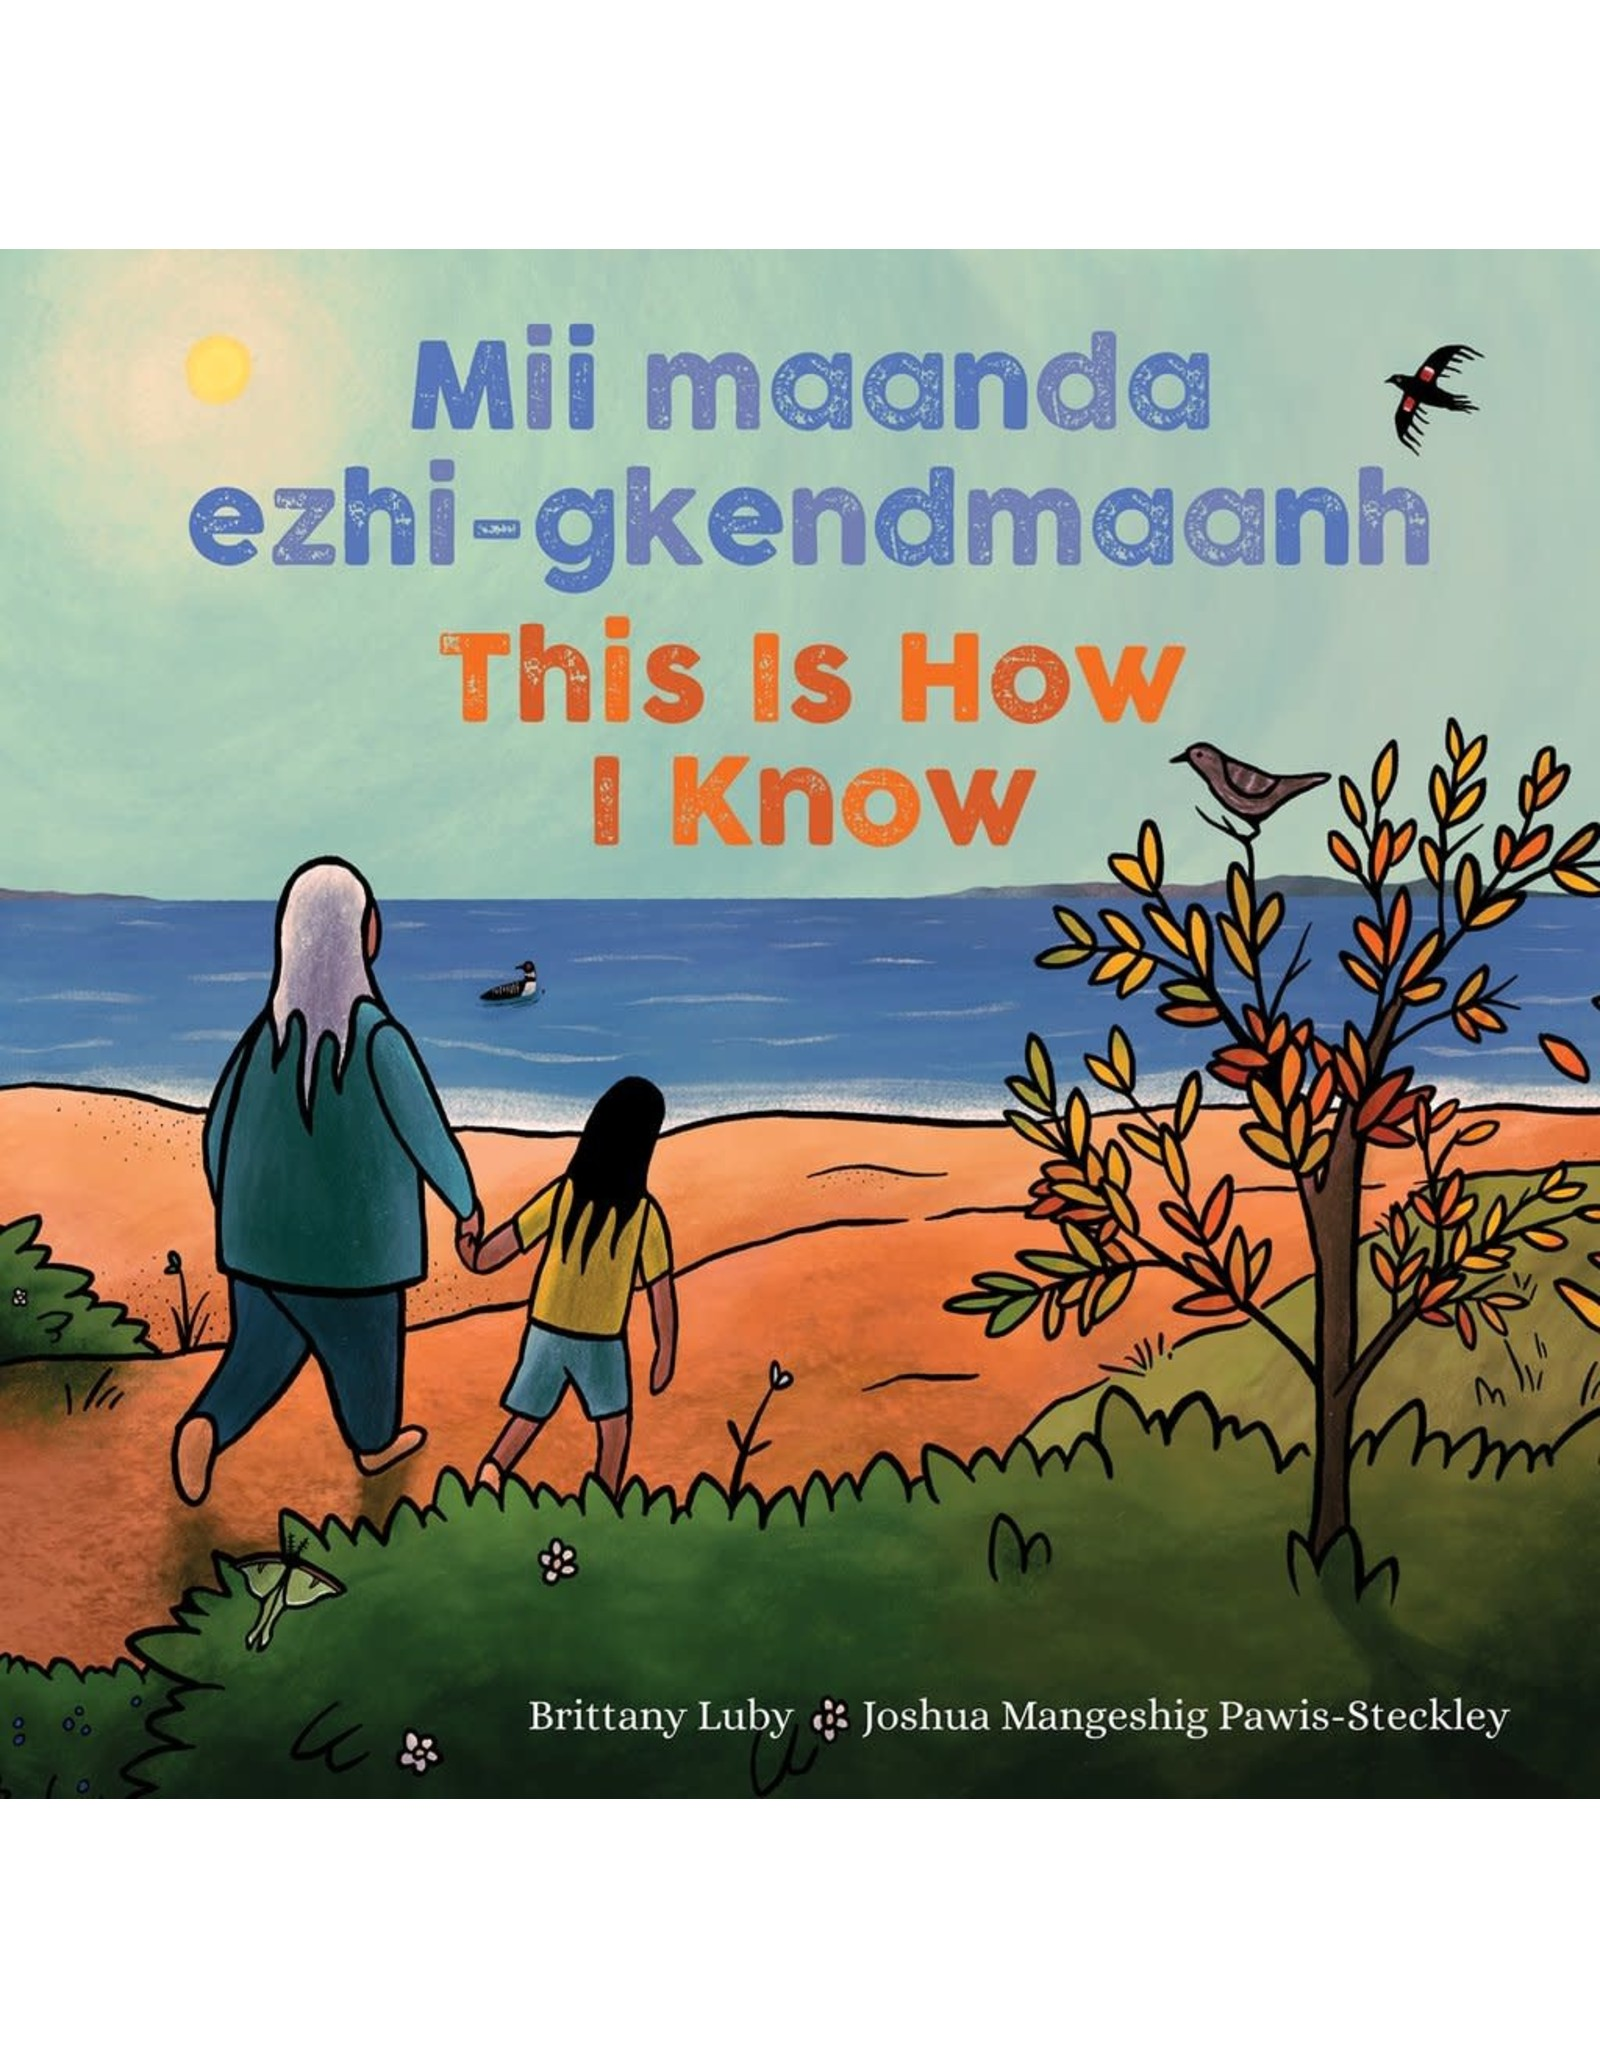 Groundwood Mii maanda ezhi-gkendmaanh / This Is How I Know